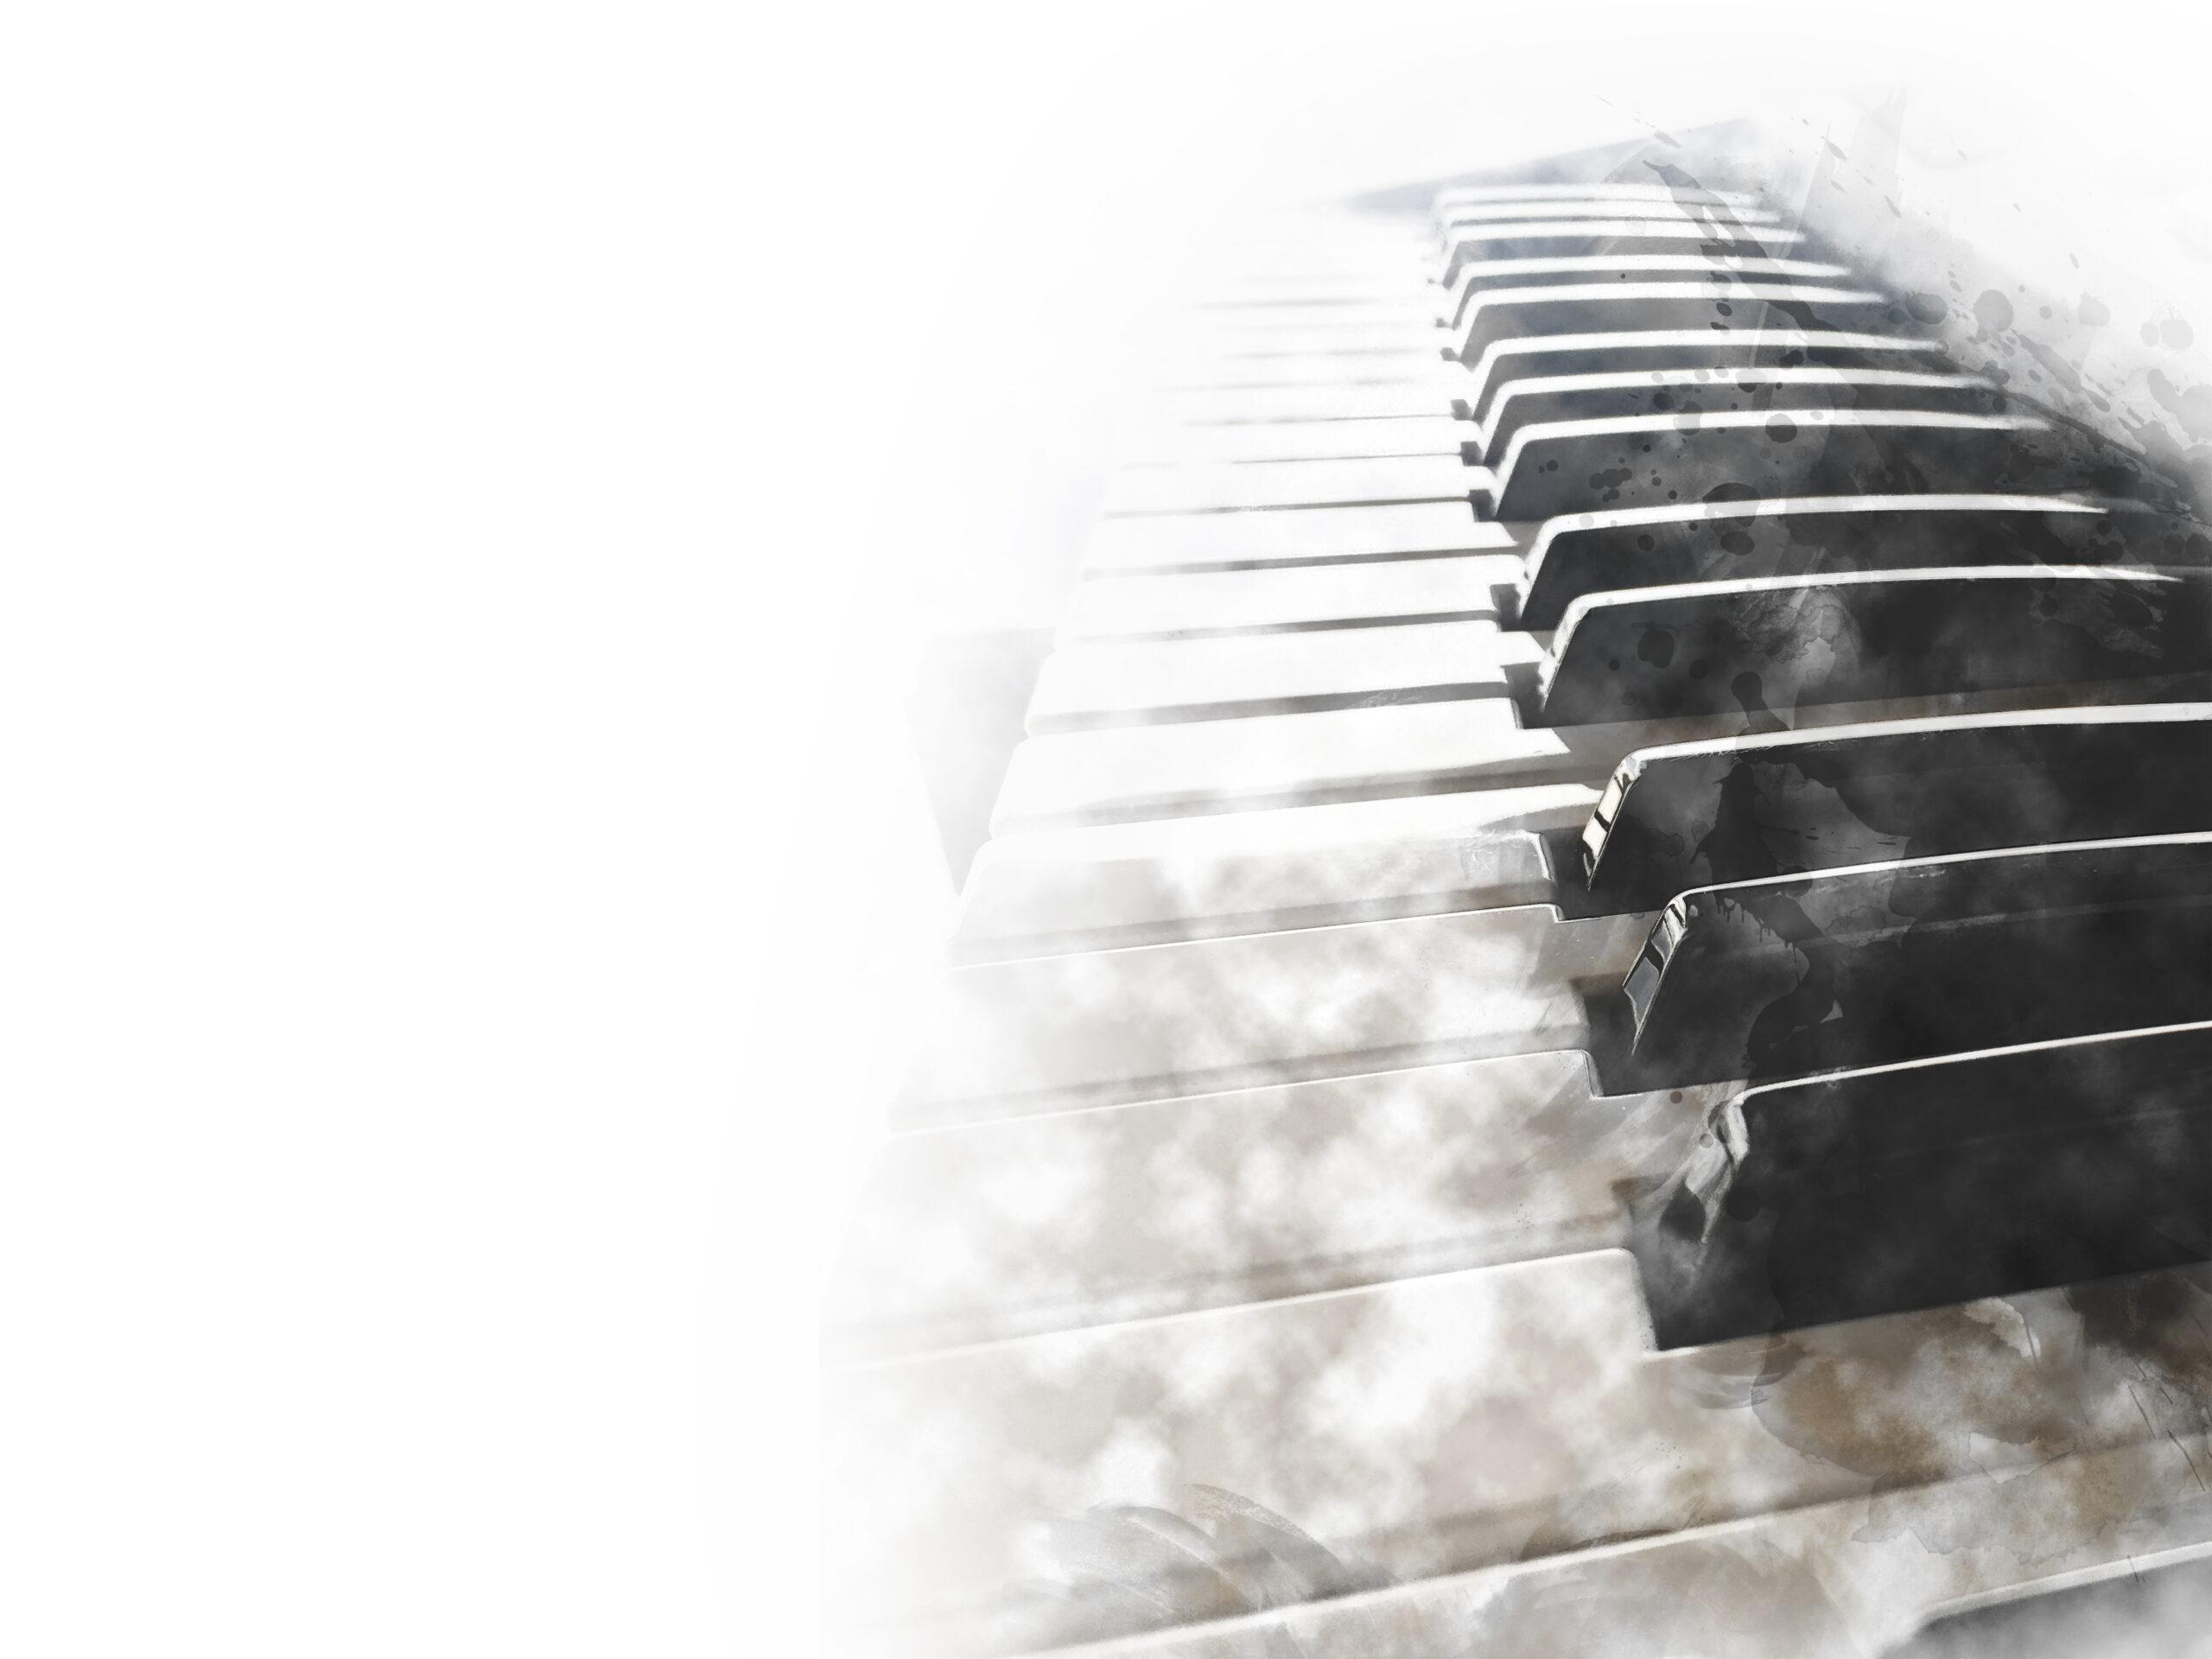 Lakmaker's T-Jazz background image